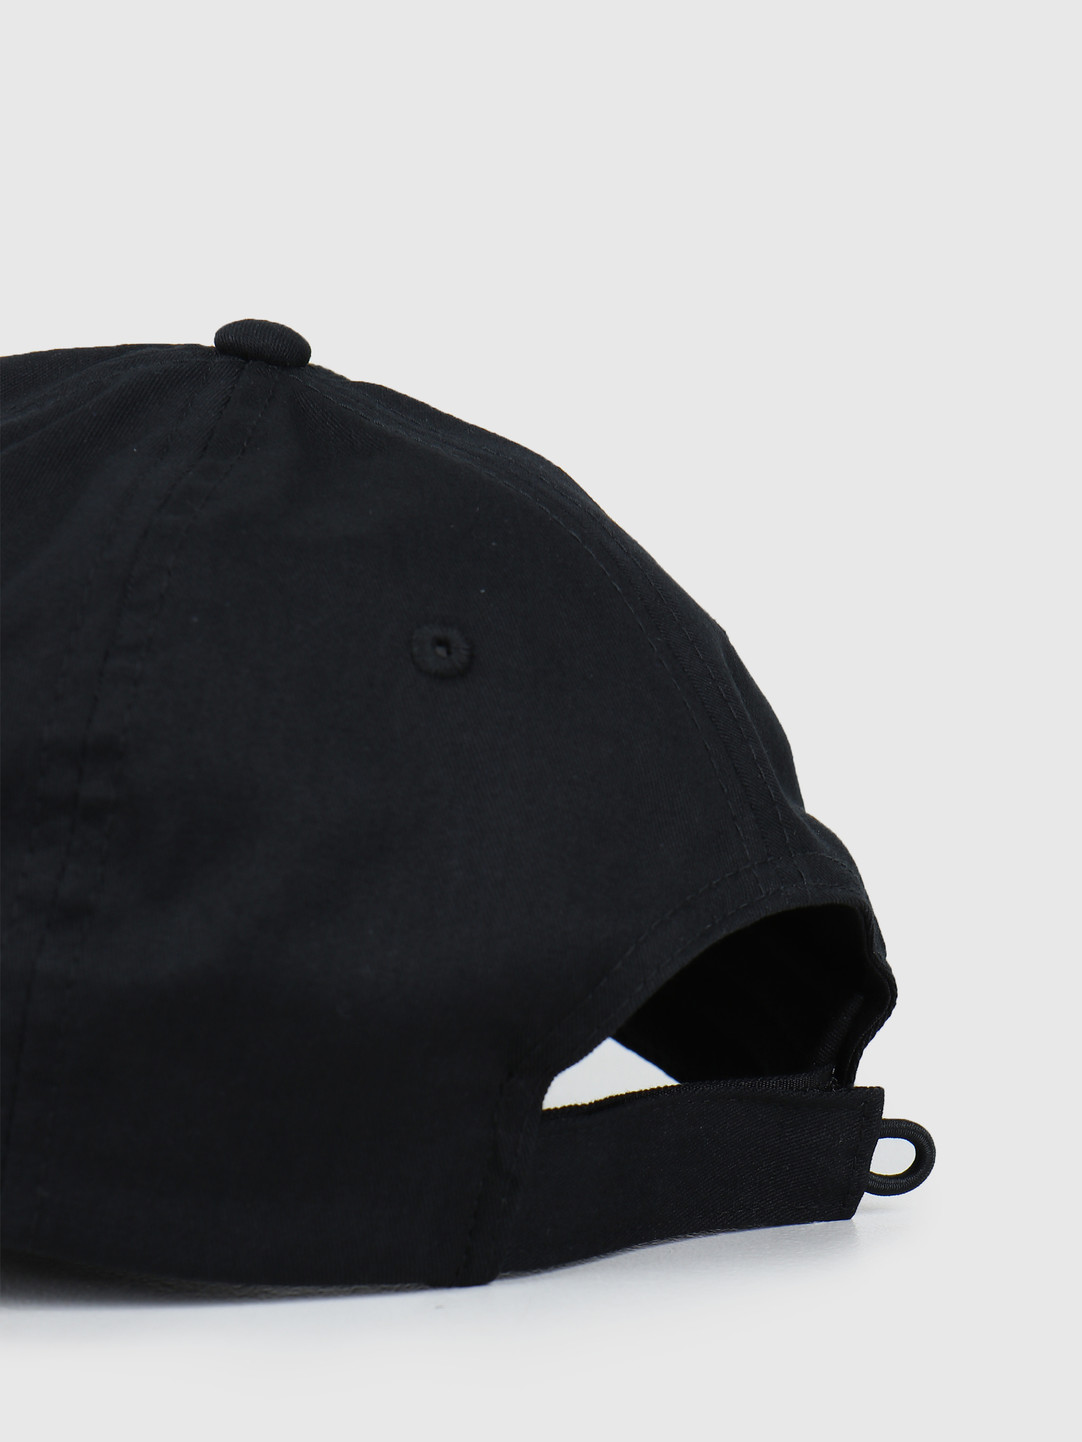 Columbia Columbia ROC II Hat Black, White 1766611013